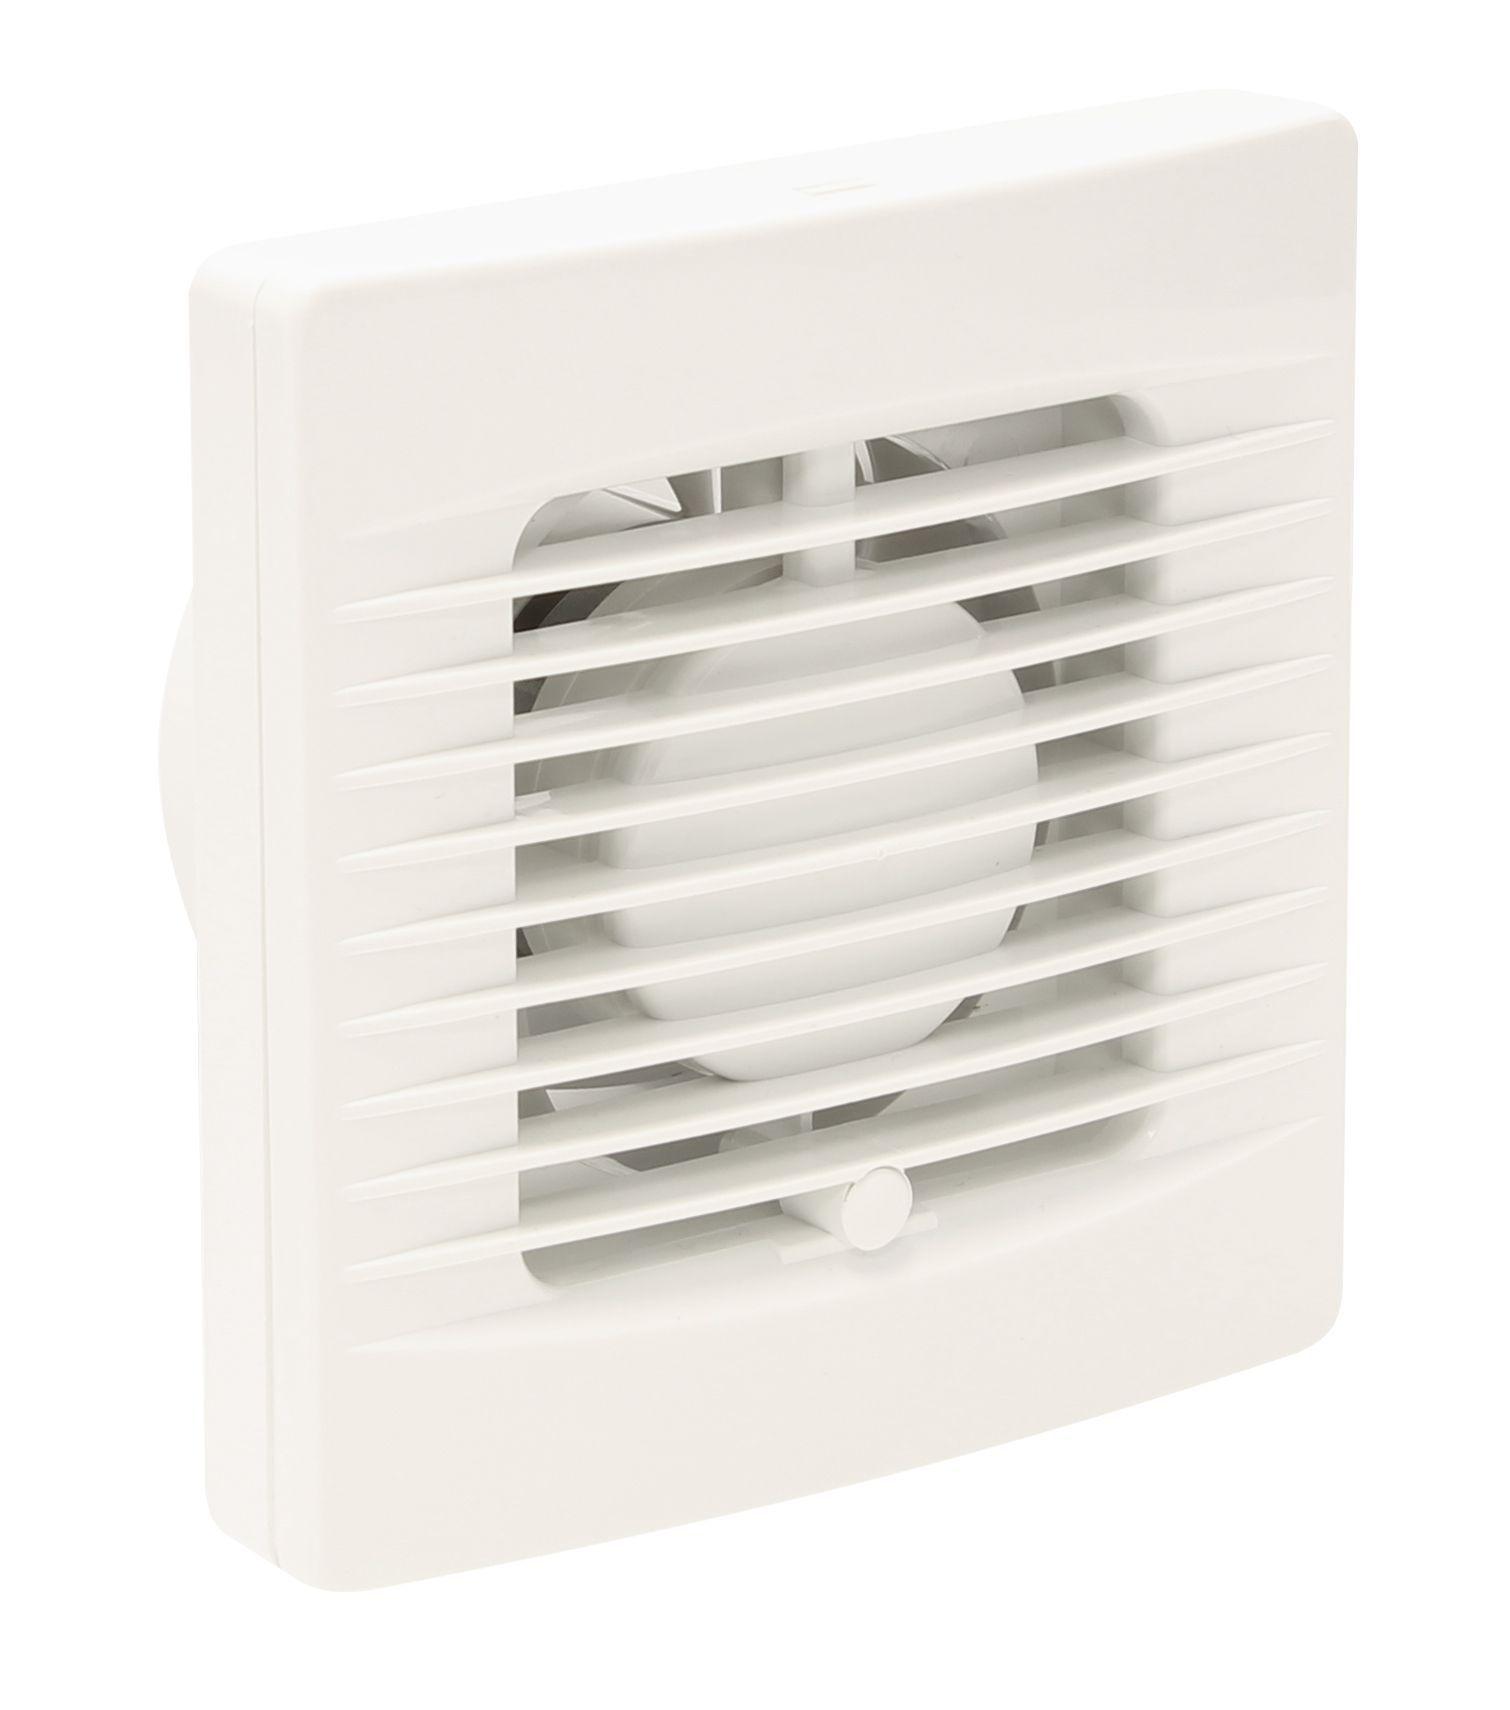 manrose vxf100s bathroom extractor fan departments diy at bq - Bathroom Extractor Fan